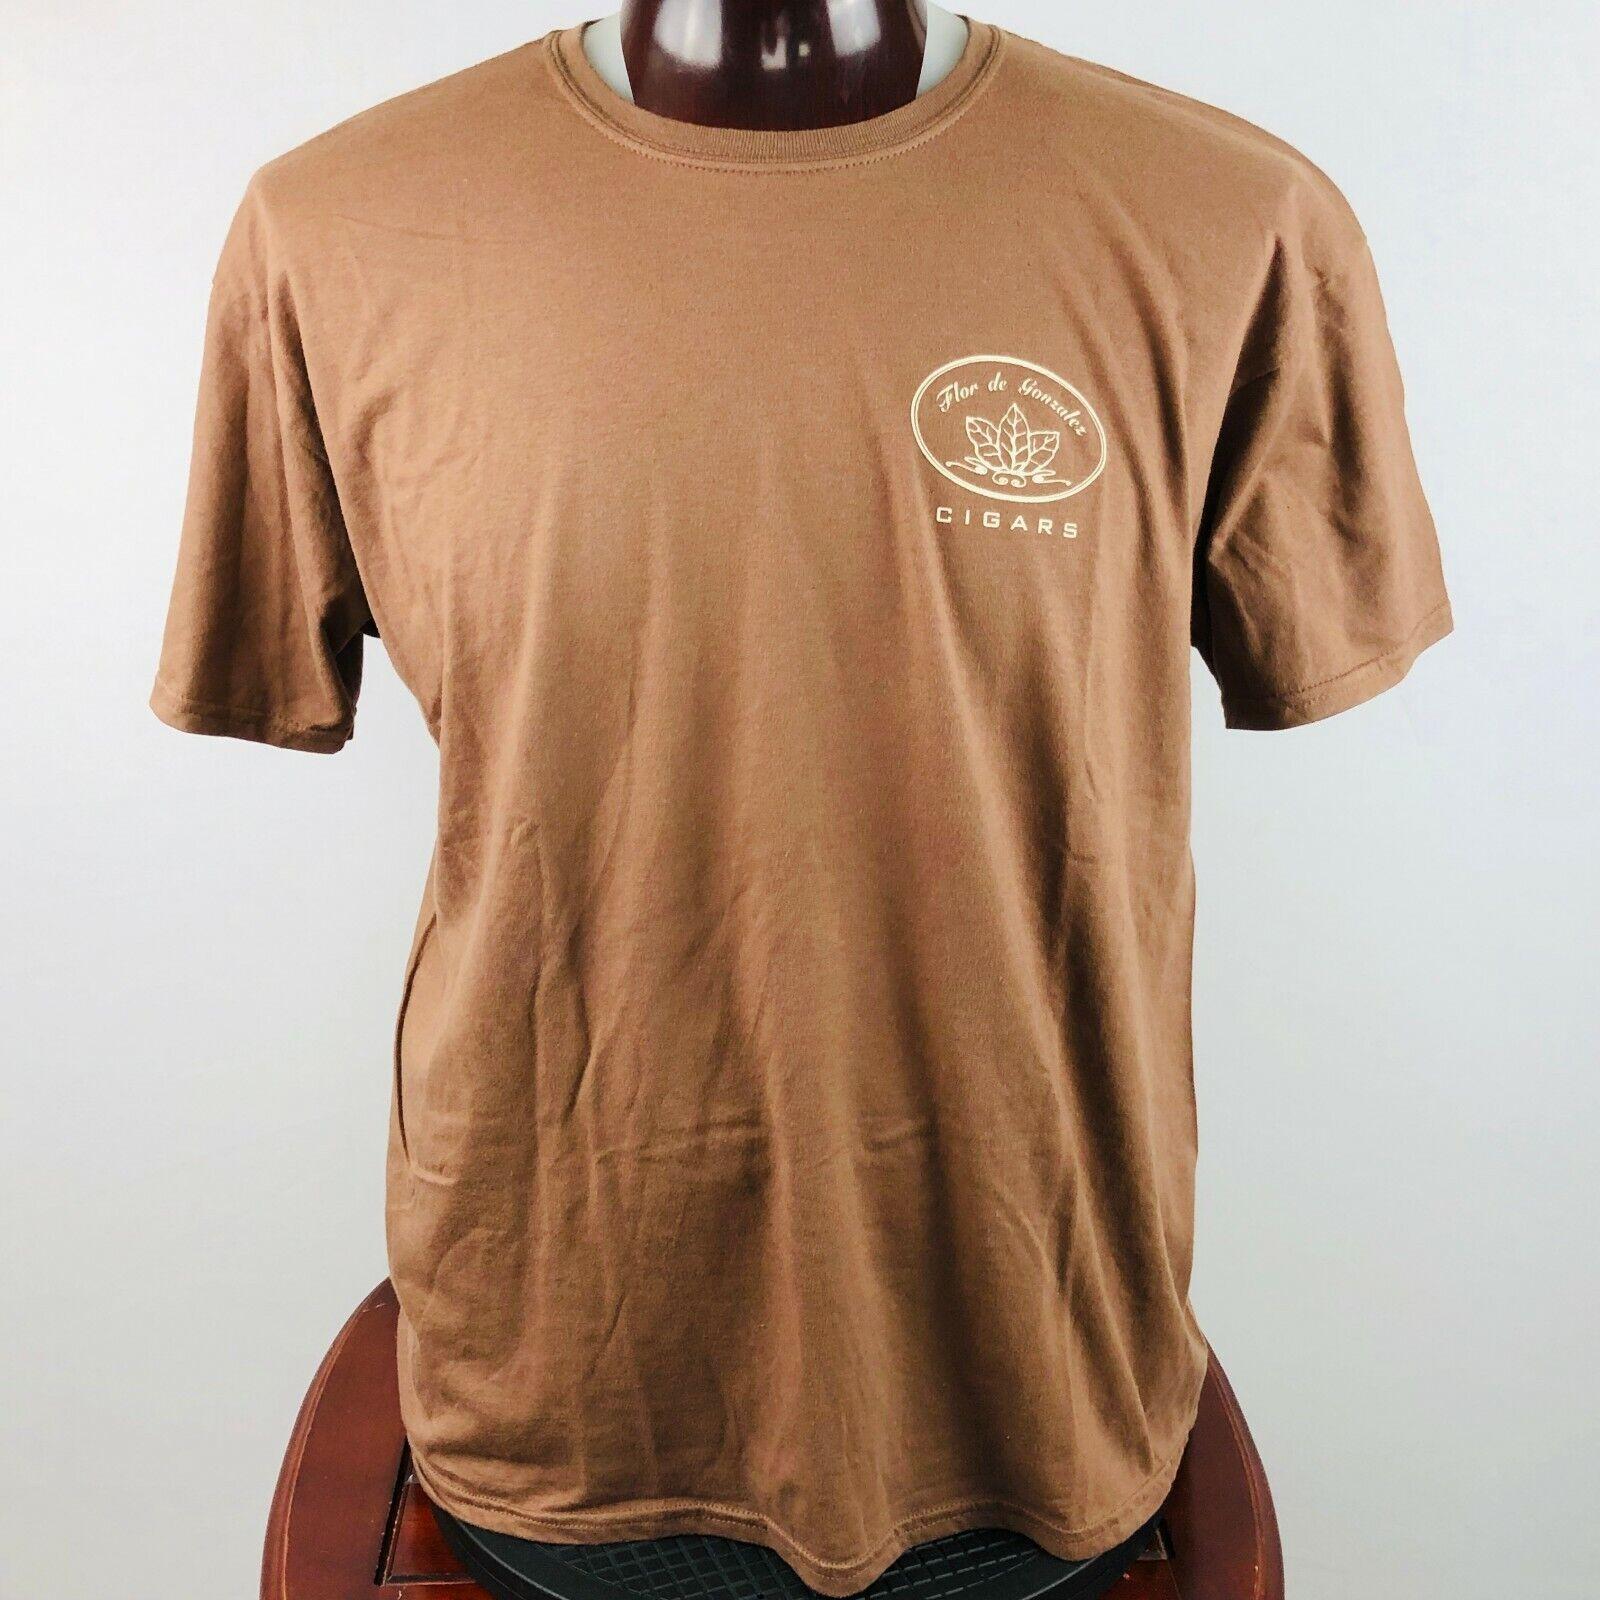 Flor de Gonzalez Cigars Mens XL Graphic T Shirt